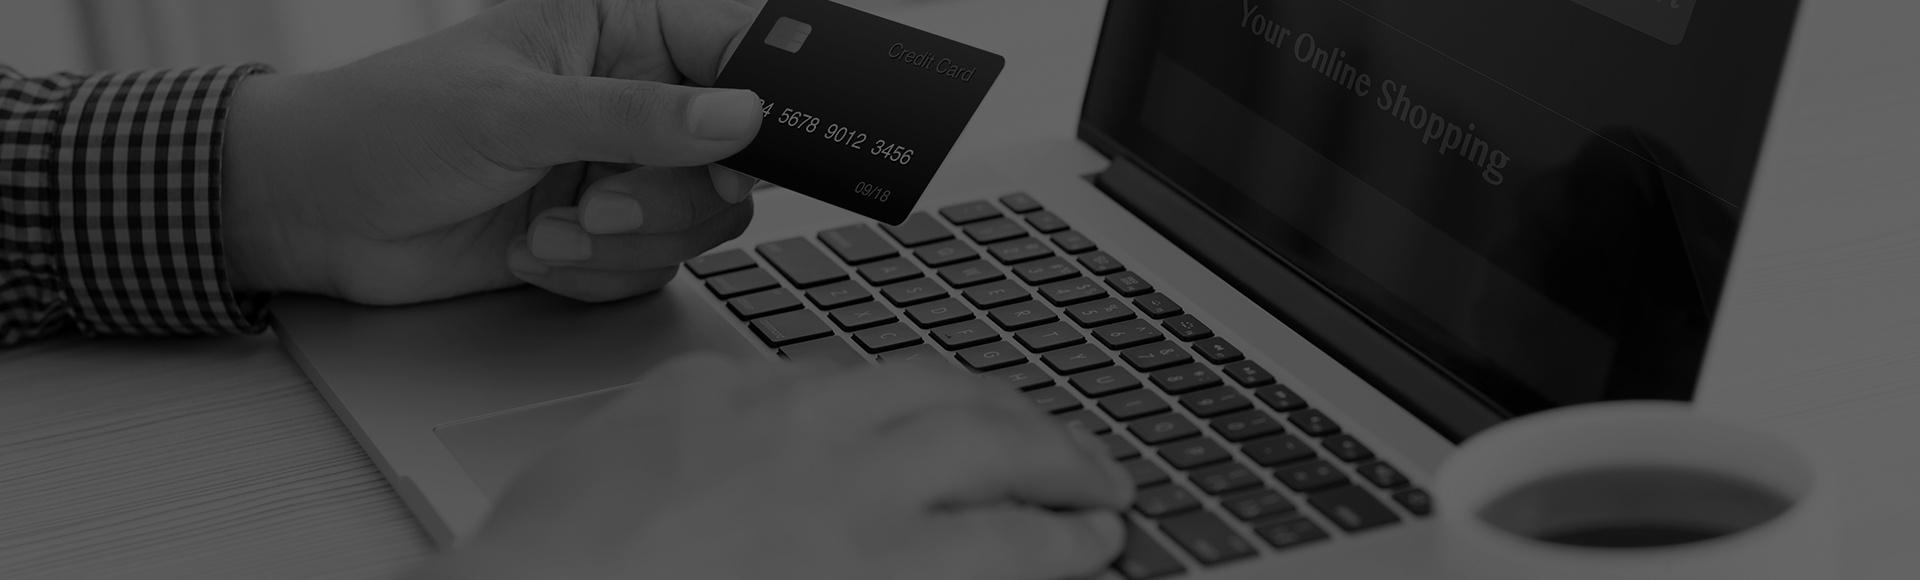 E-Commerce Website Services, Nexa, Dubai, UAE